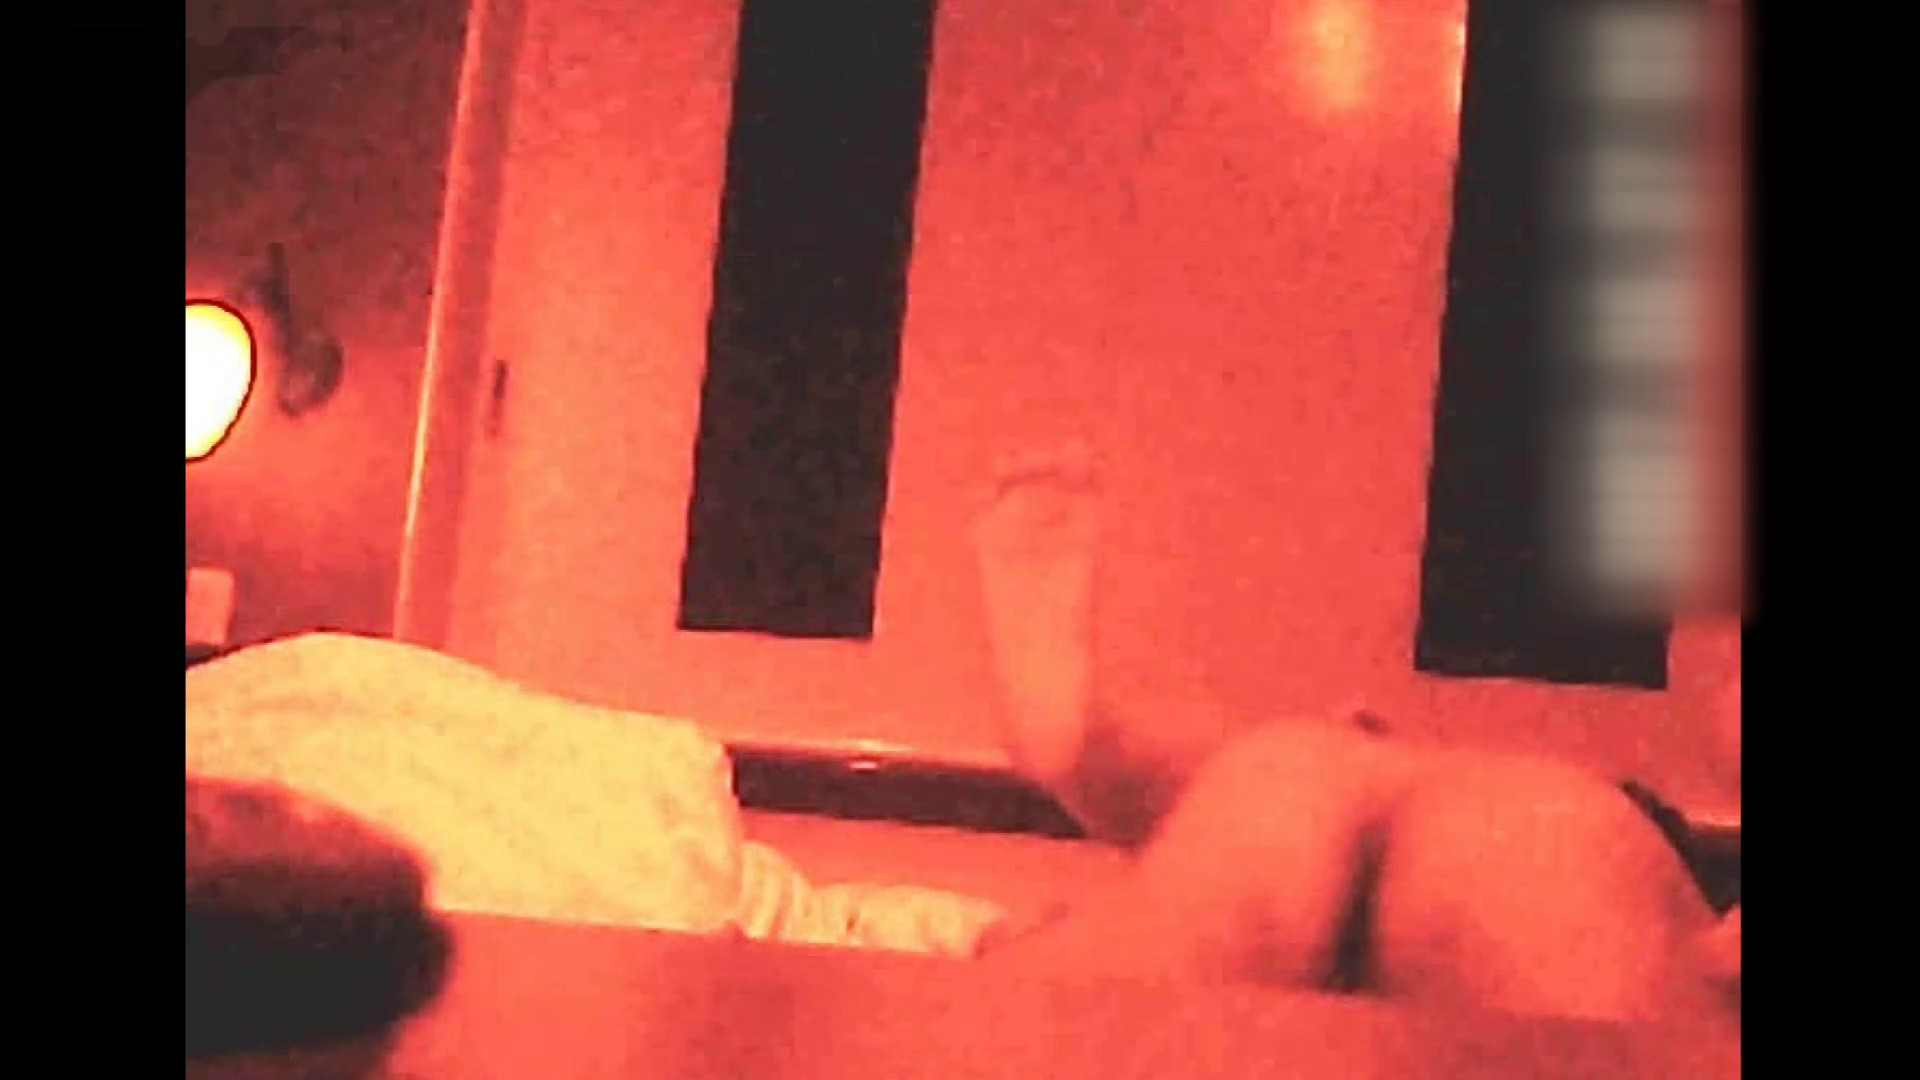 ▲2017_05位▲ 学園アイドル美人女子大生!❶4人厳選詰合せVol.49 人気作   女子大生  113画像 20